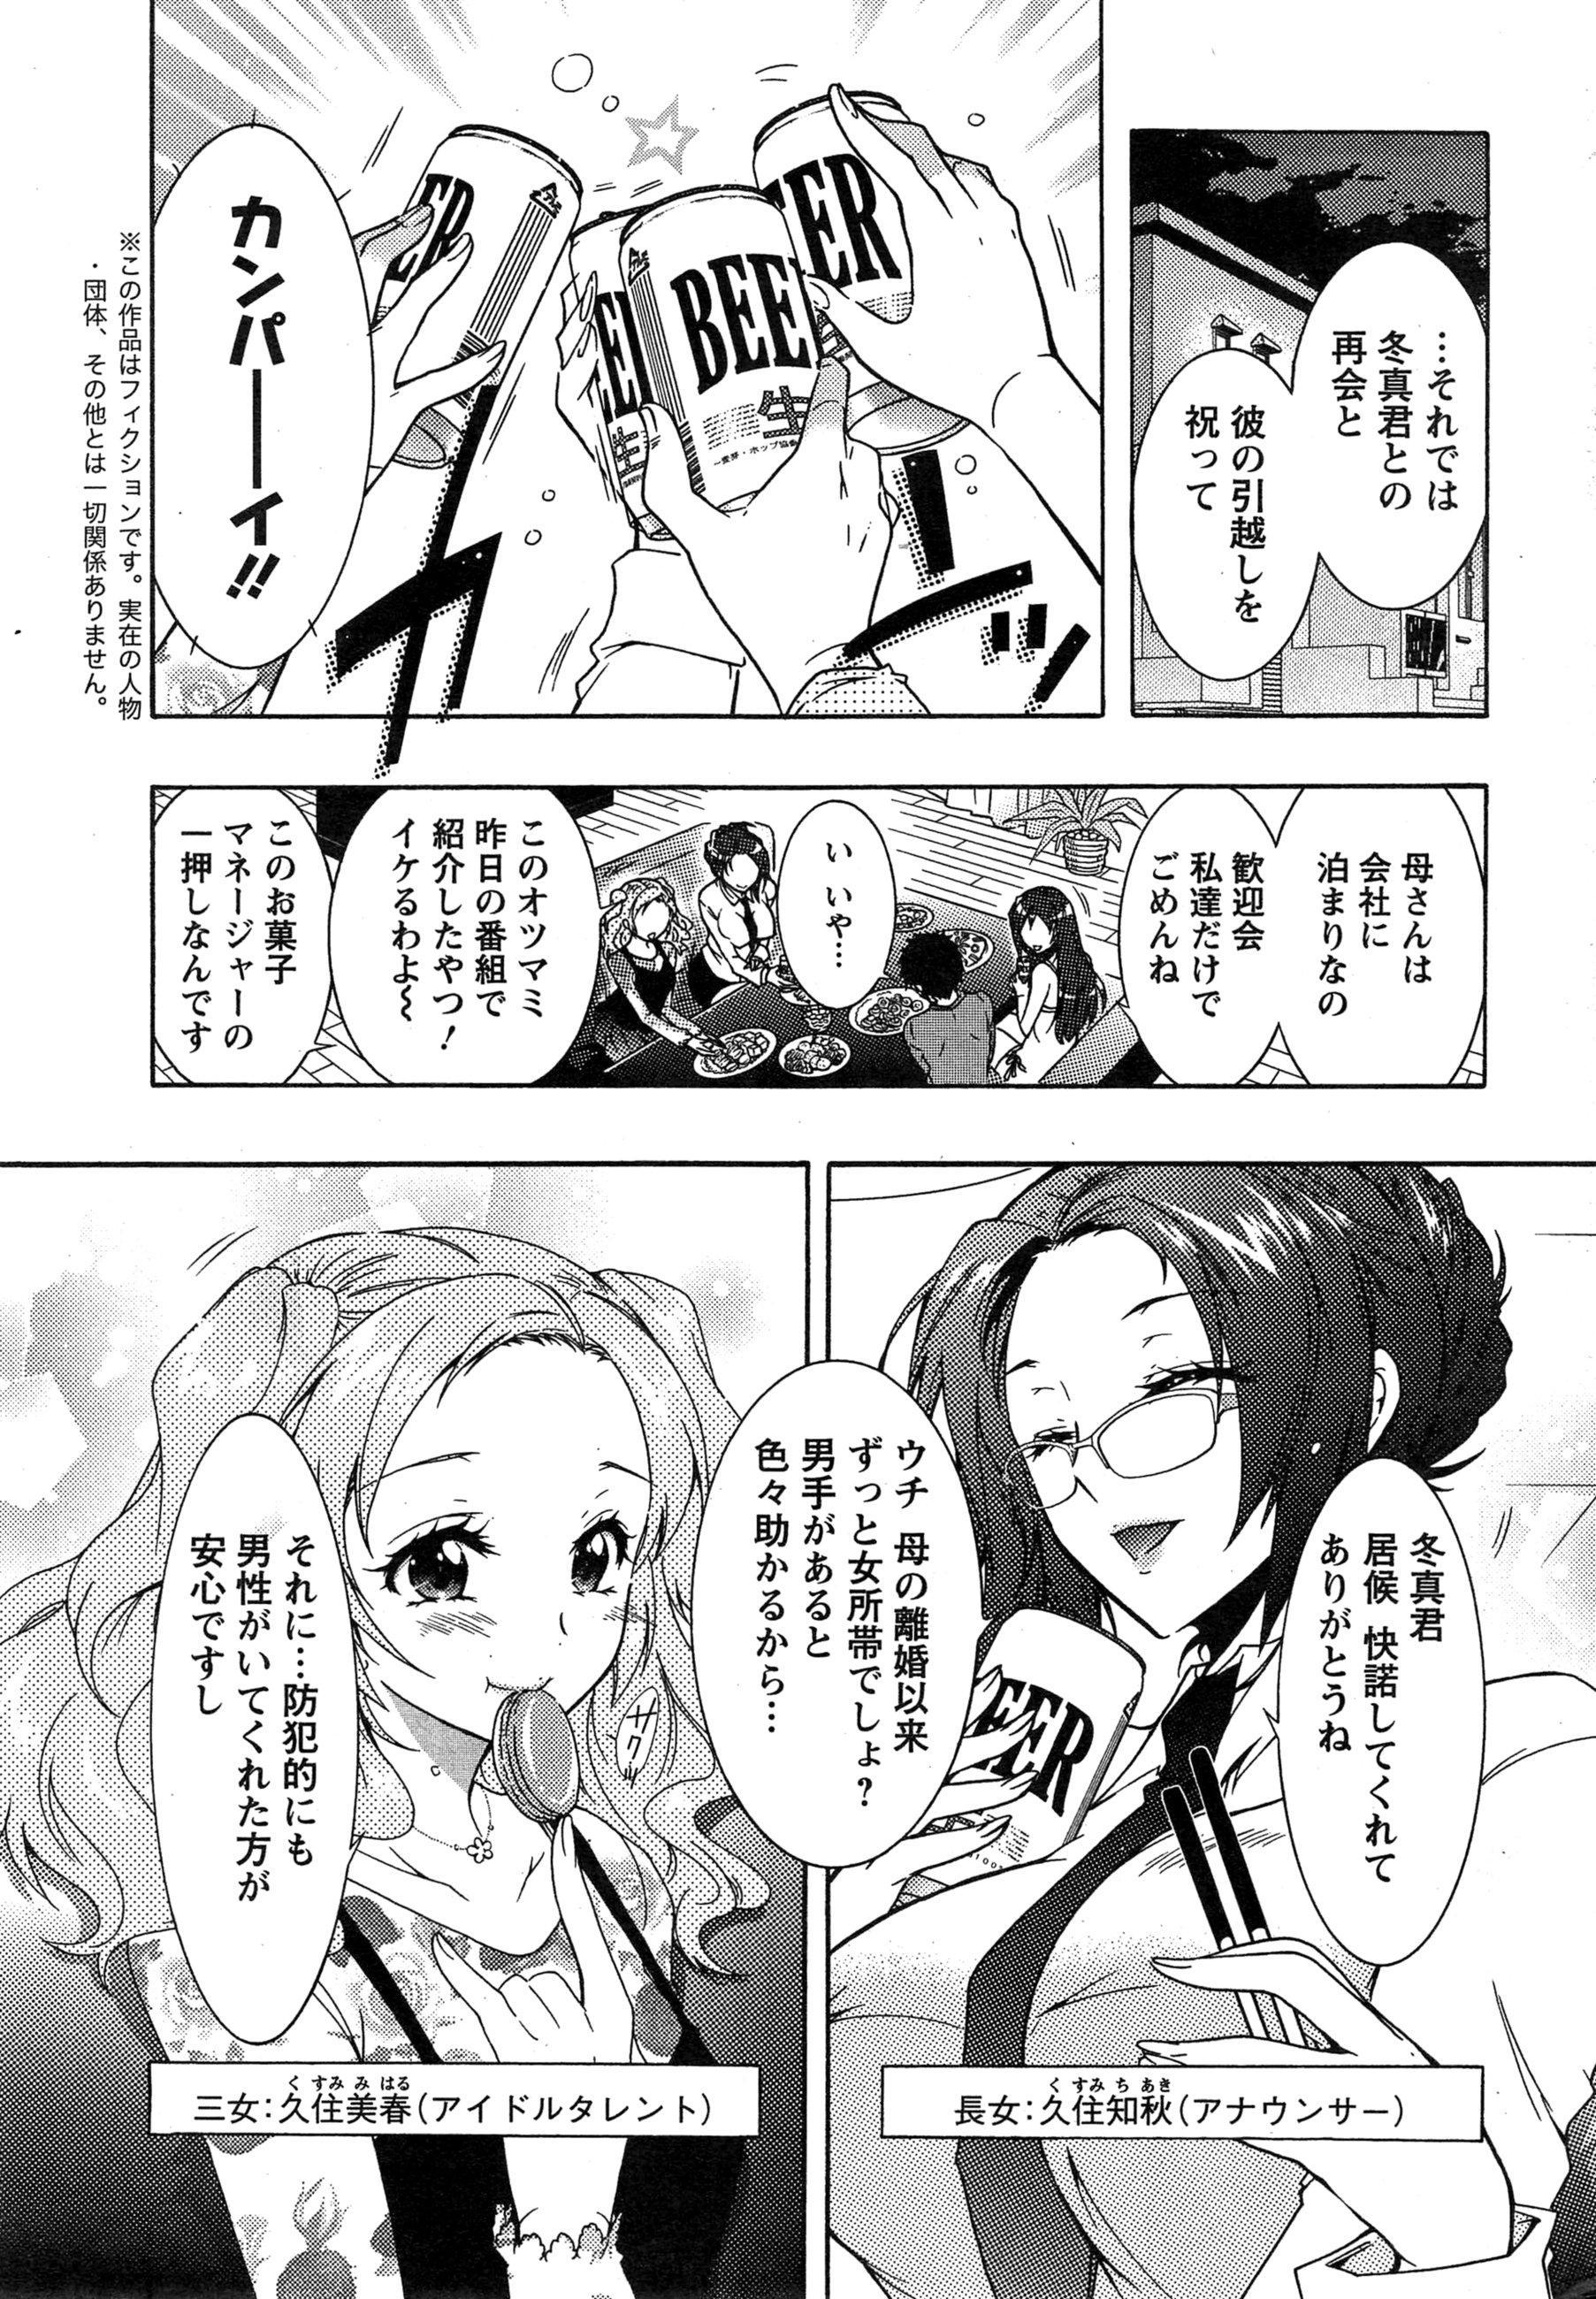 [Honda Arima] Sanshimai no Omocha - The Slave of Three Sisters Ch. 1-6 7